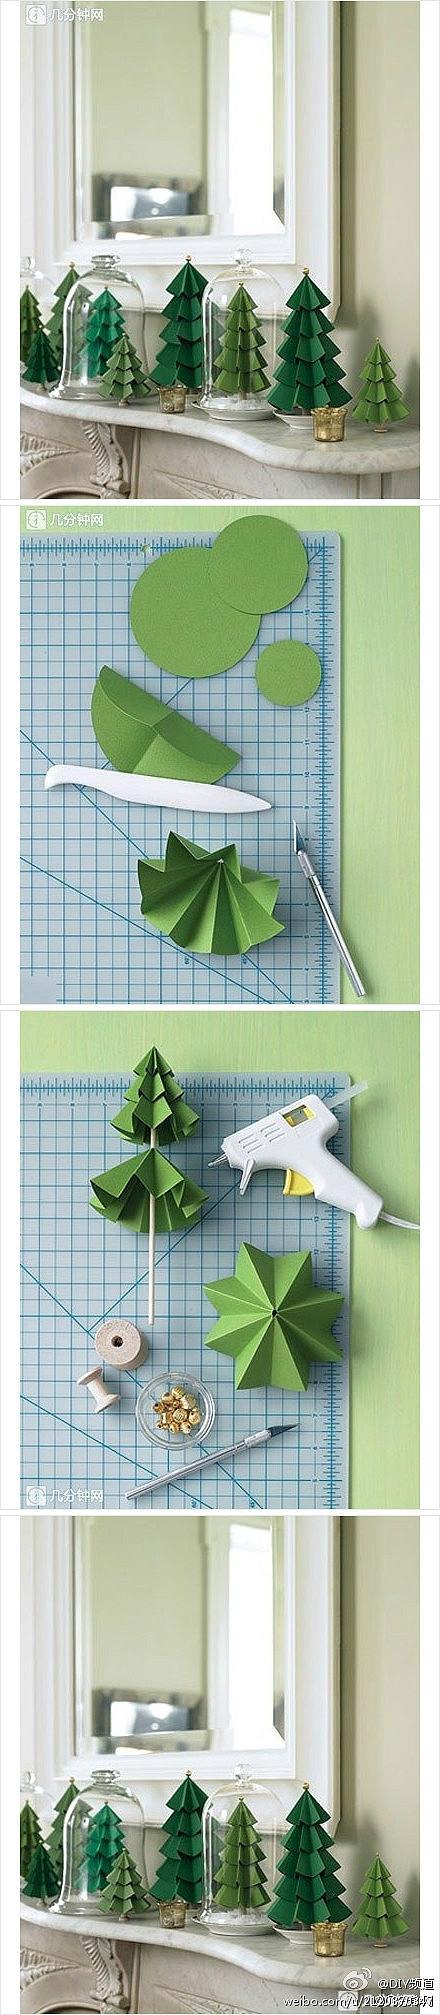 How to make paper craft christmas trees step by step diy tutorial how to make paper craft christmas trees step by step diy tutorial instructions how to solutioingenieria Choice Image